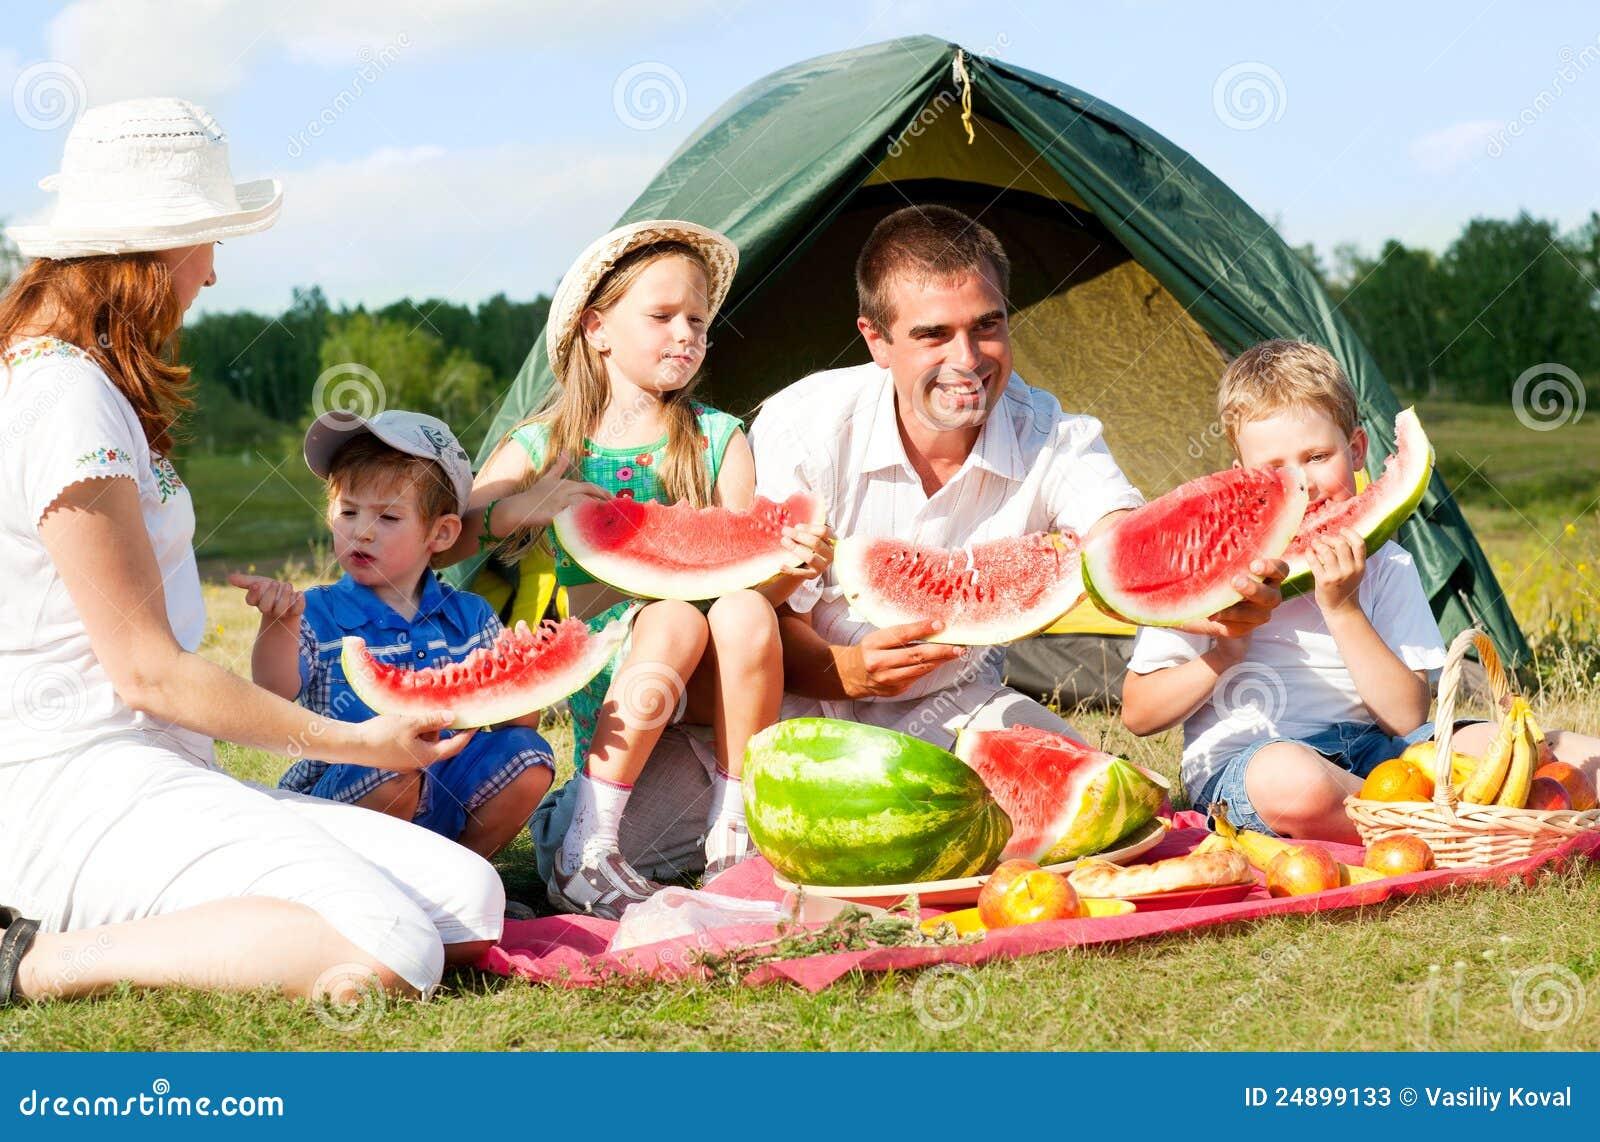 family picnic stock photos image 24899133 Family Picnic Day Clip Art Black Family Picnic Clip Art